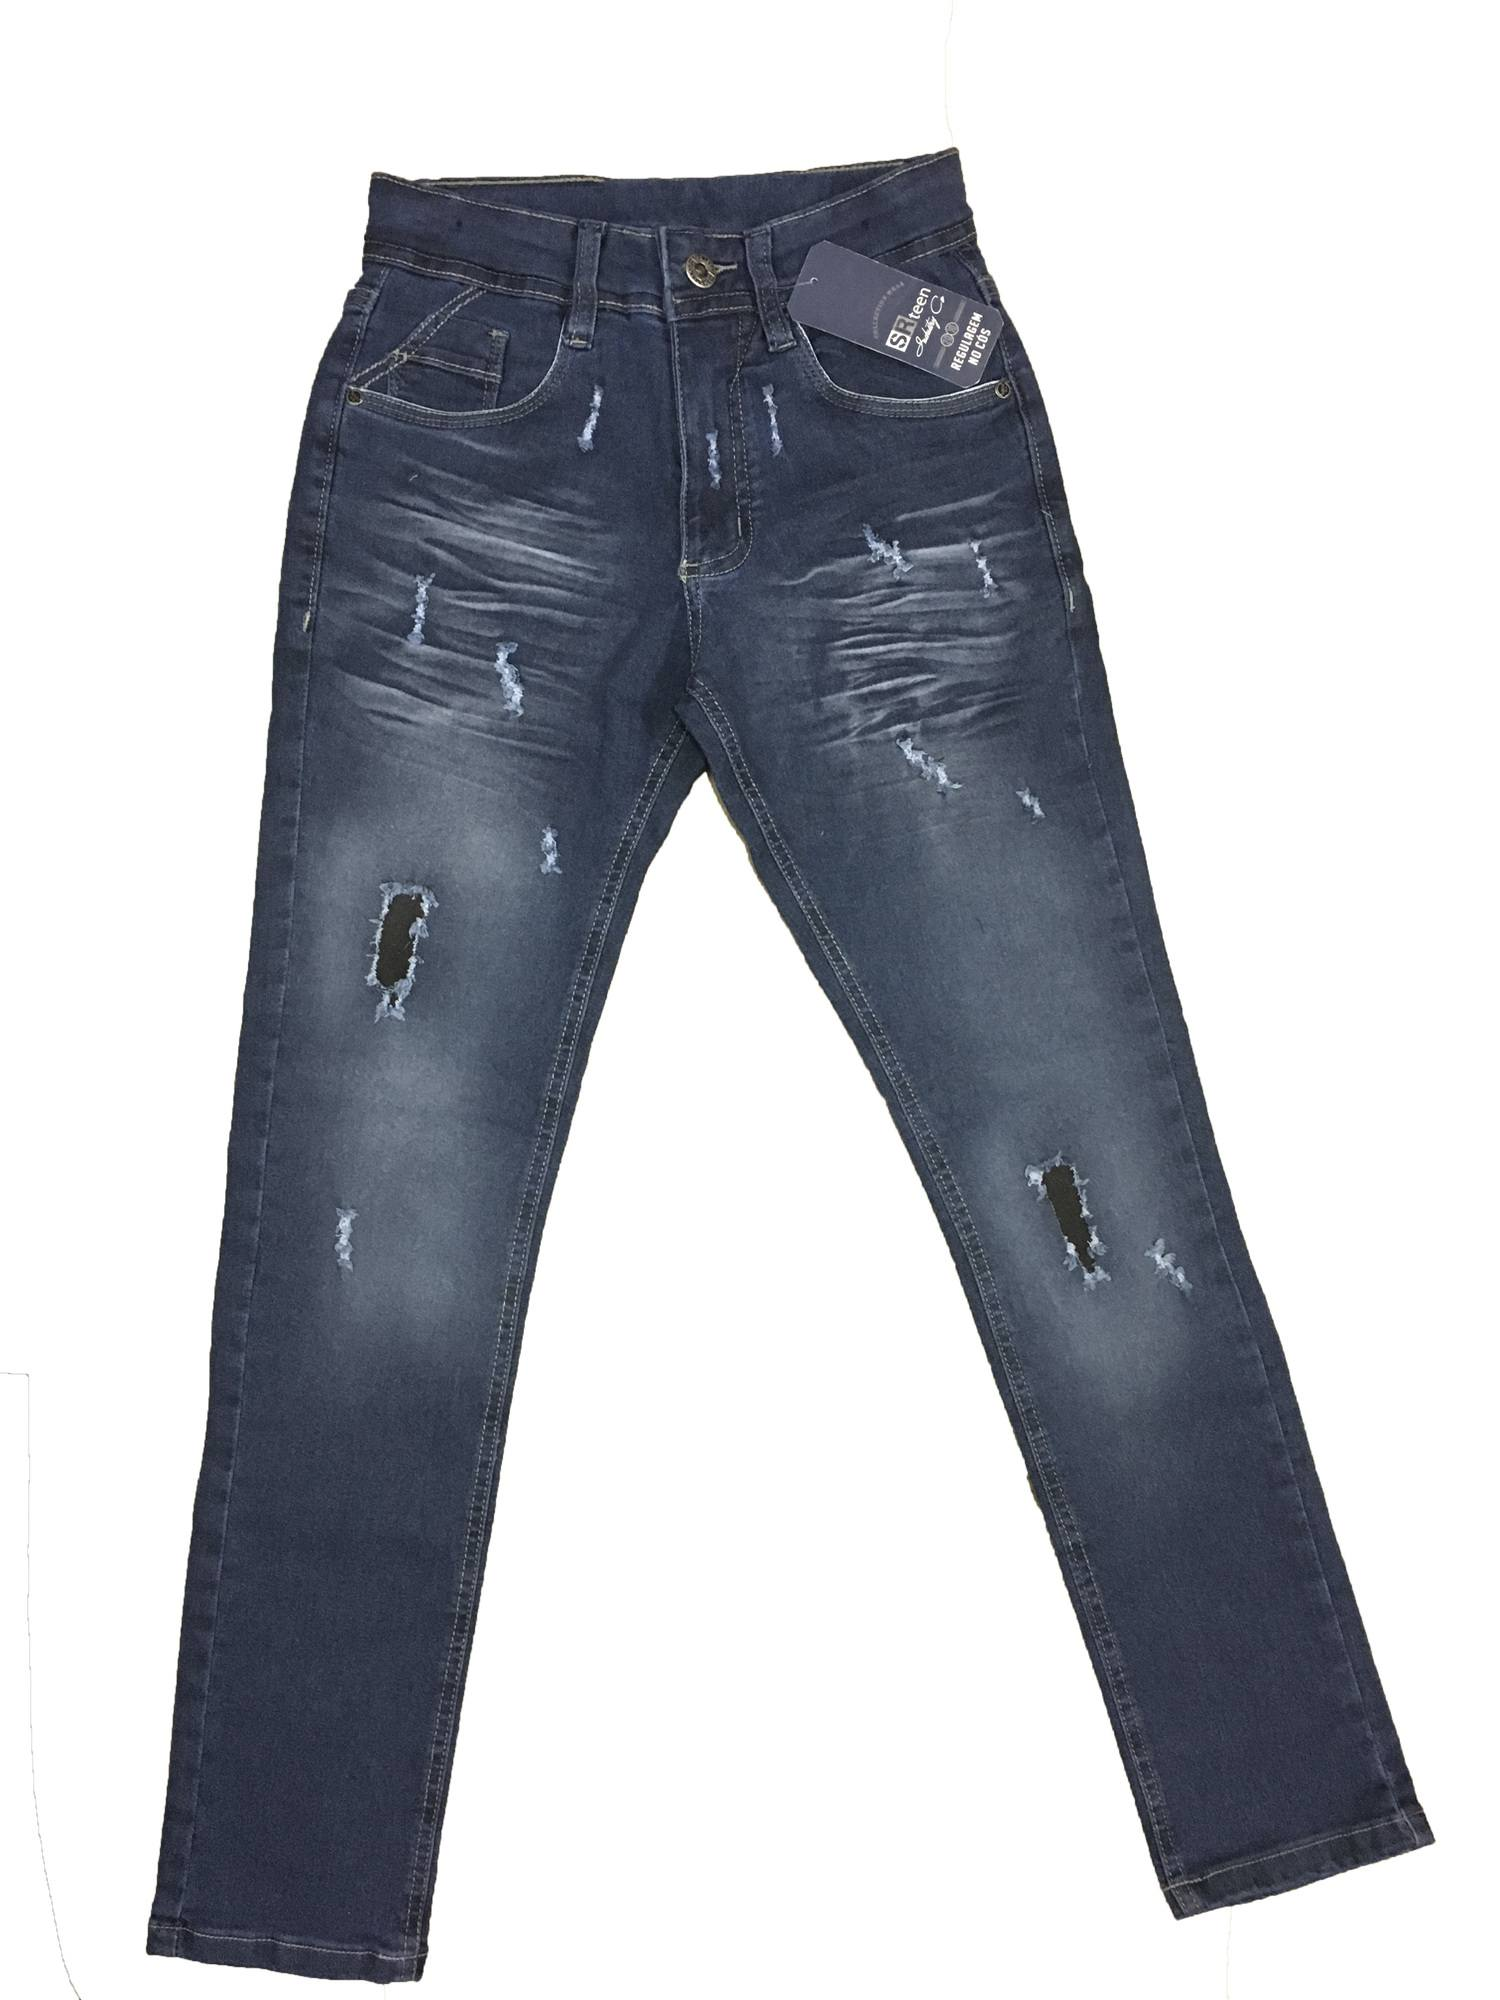 Calça Jeans Masculina Infantil [619]